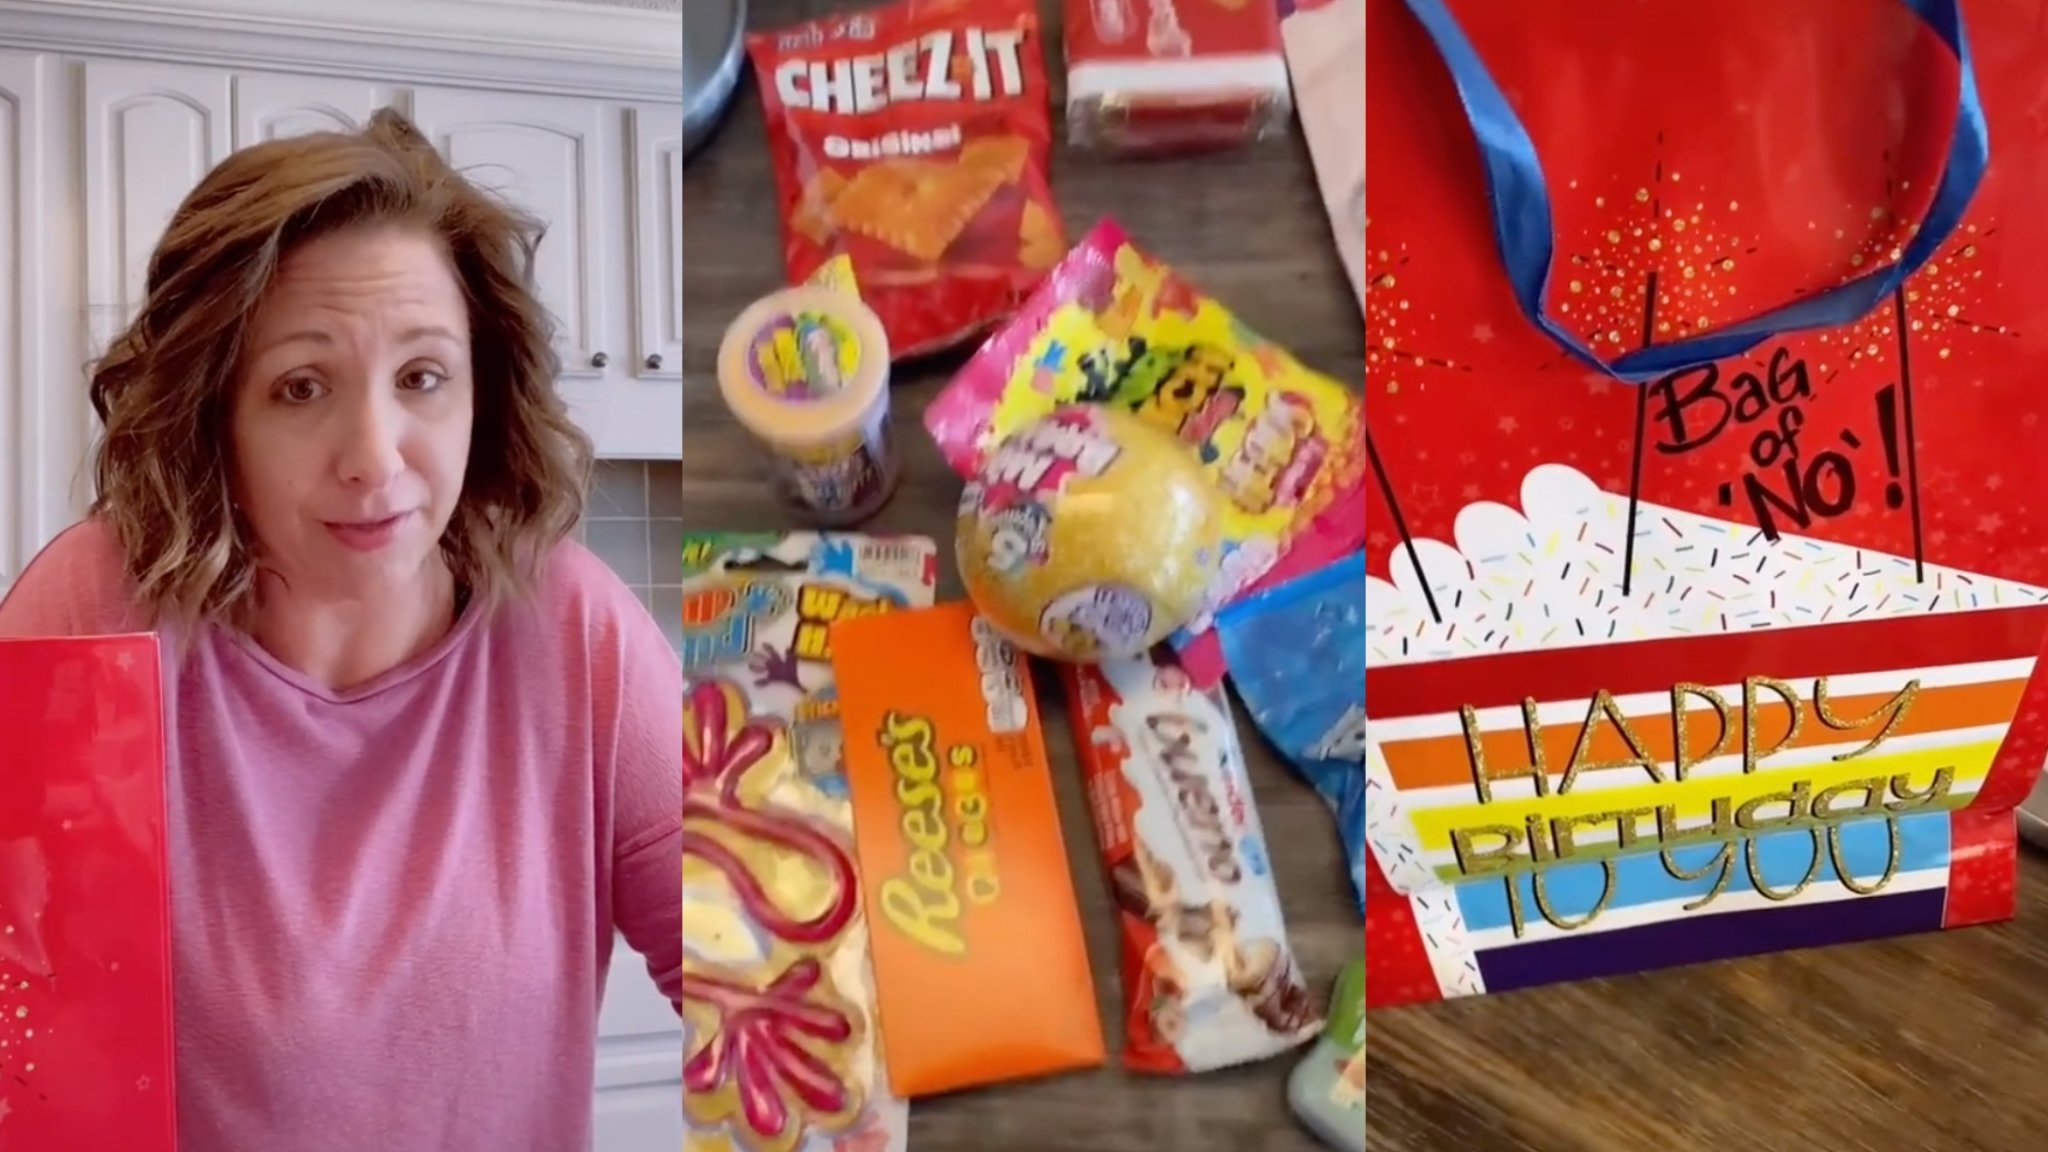 Mom Shares Bag of 'No' Birthday Tradition on TikTok & It's Pretty Genius